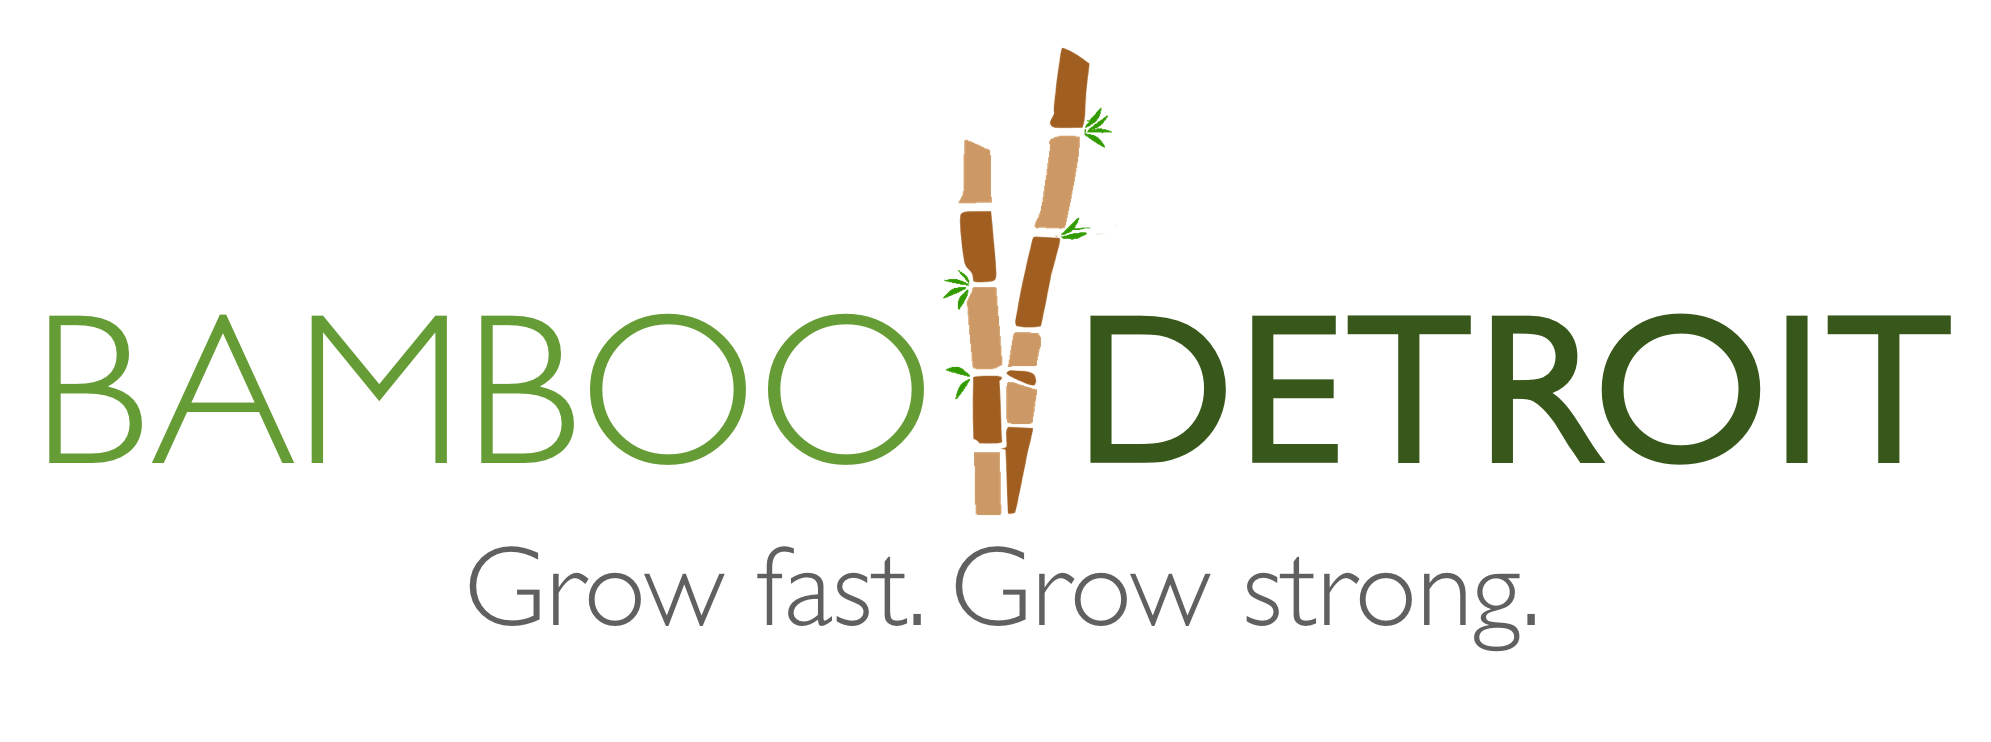 Bamboo-Detroit-